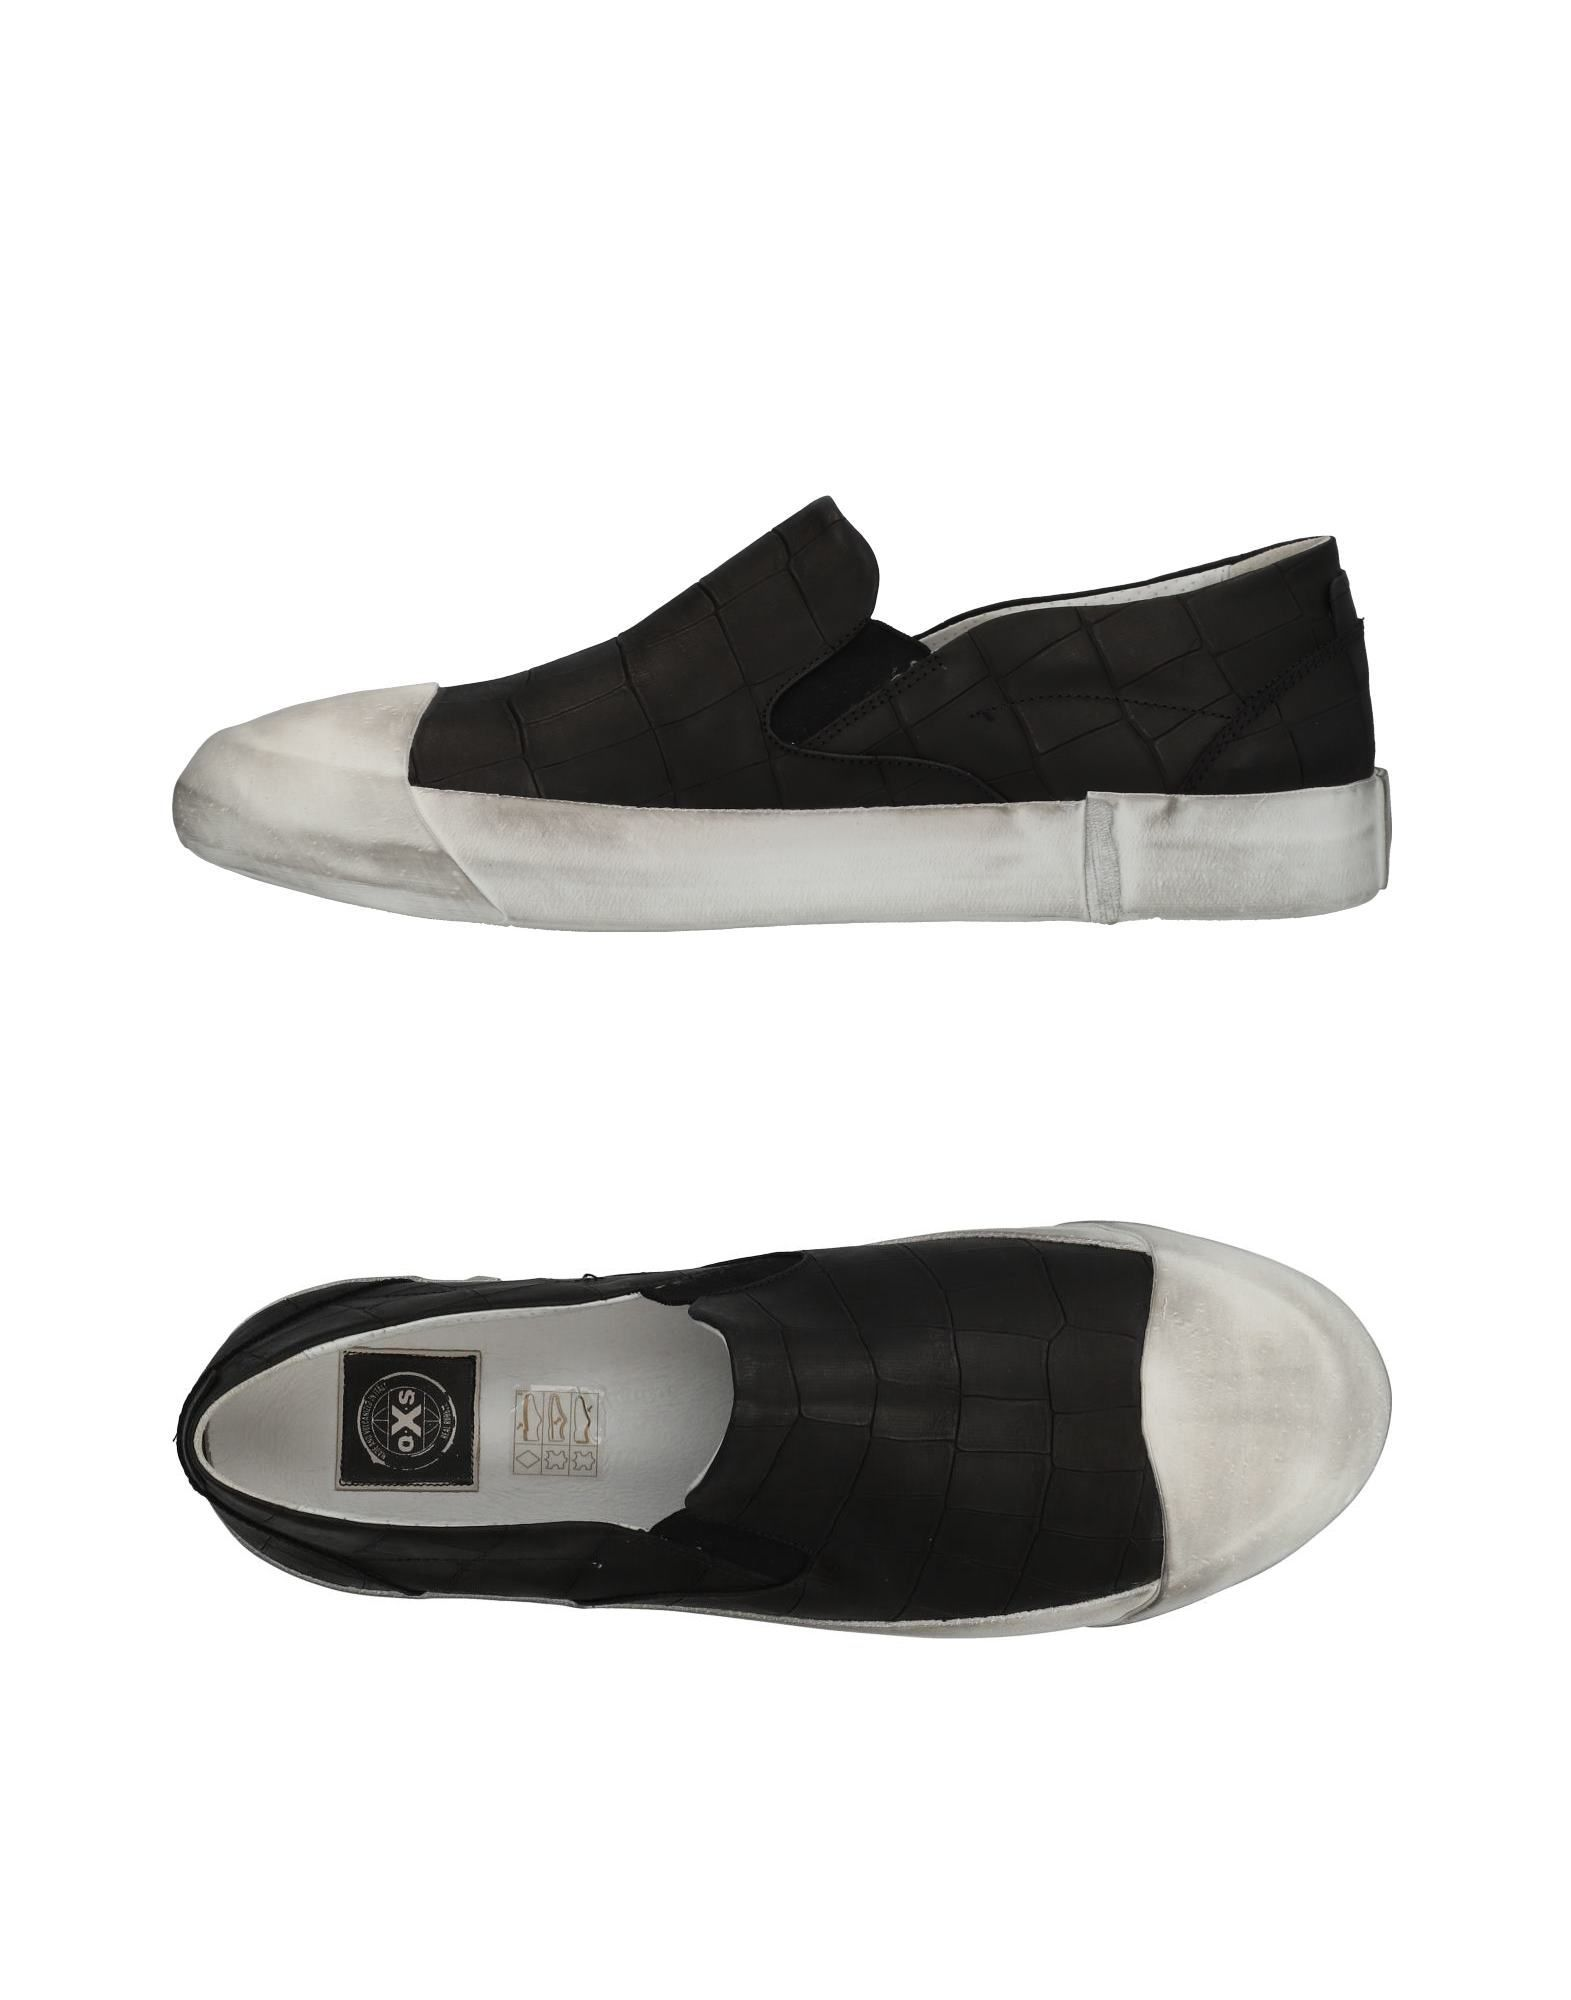 O.X.S. Sneakers Herren  11278290KR Gute Qualität beliebte Schuhe